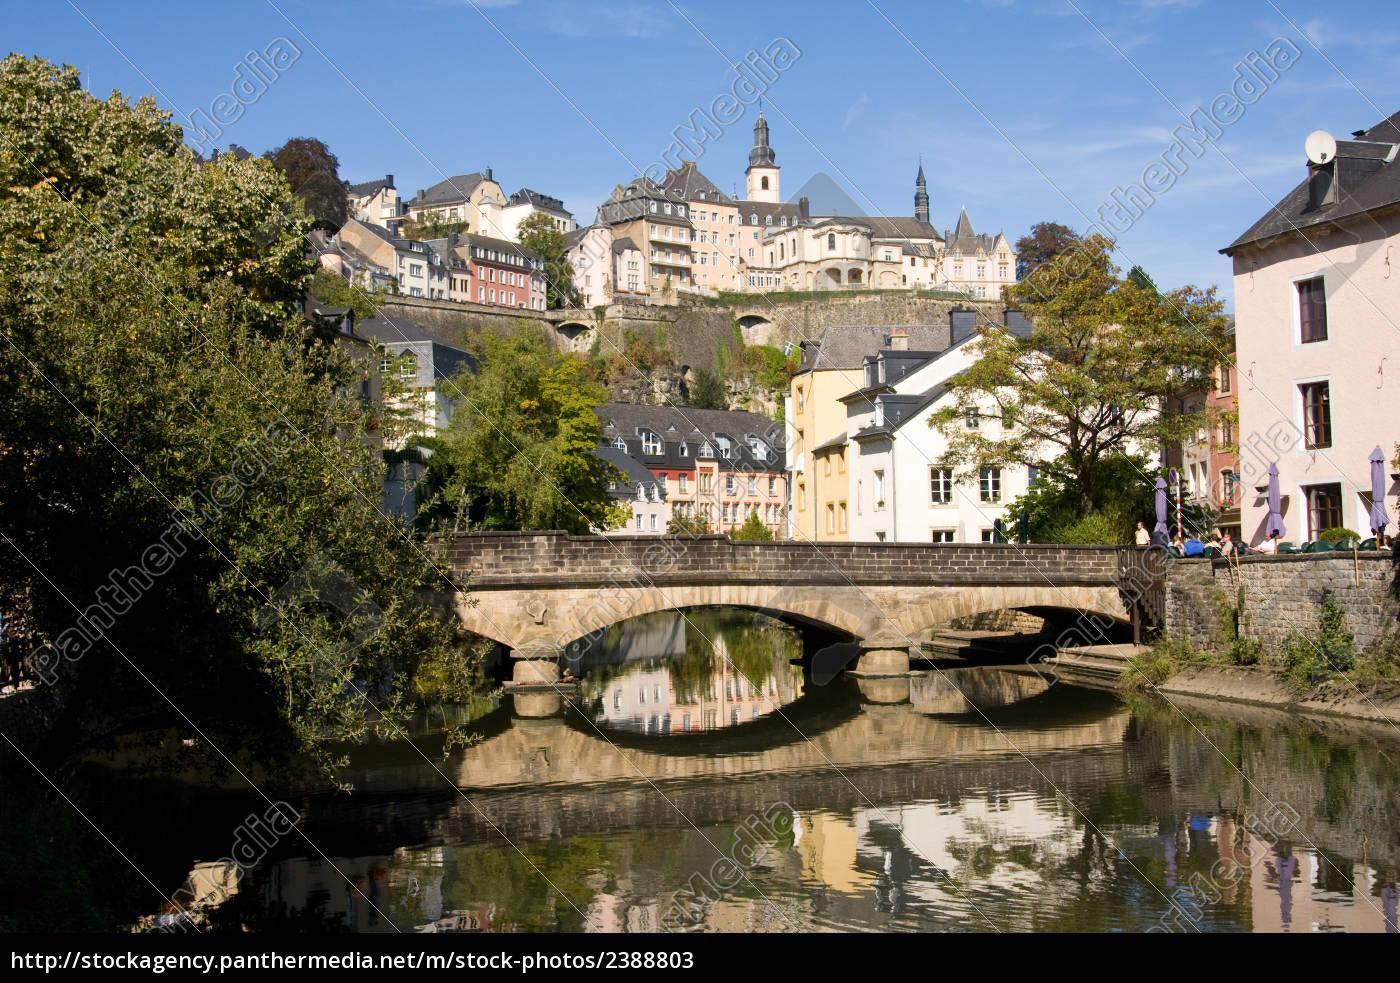 luxemburg, 287 - 2388803